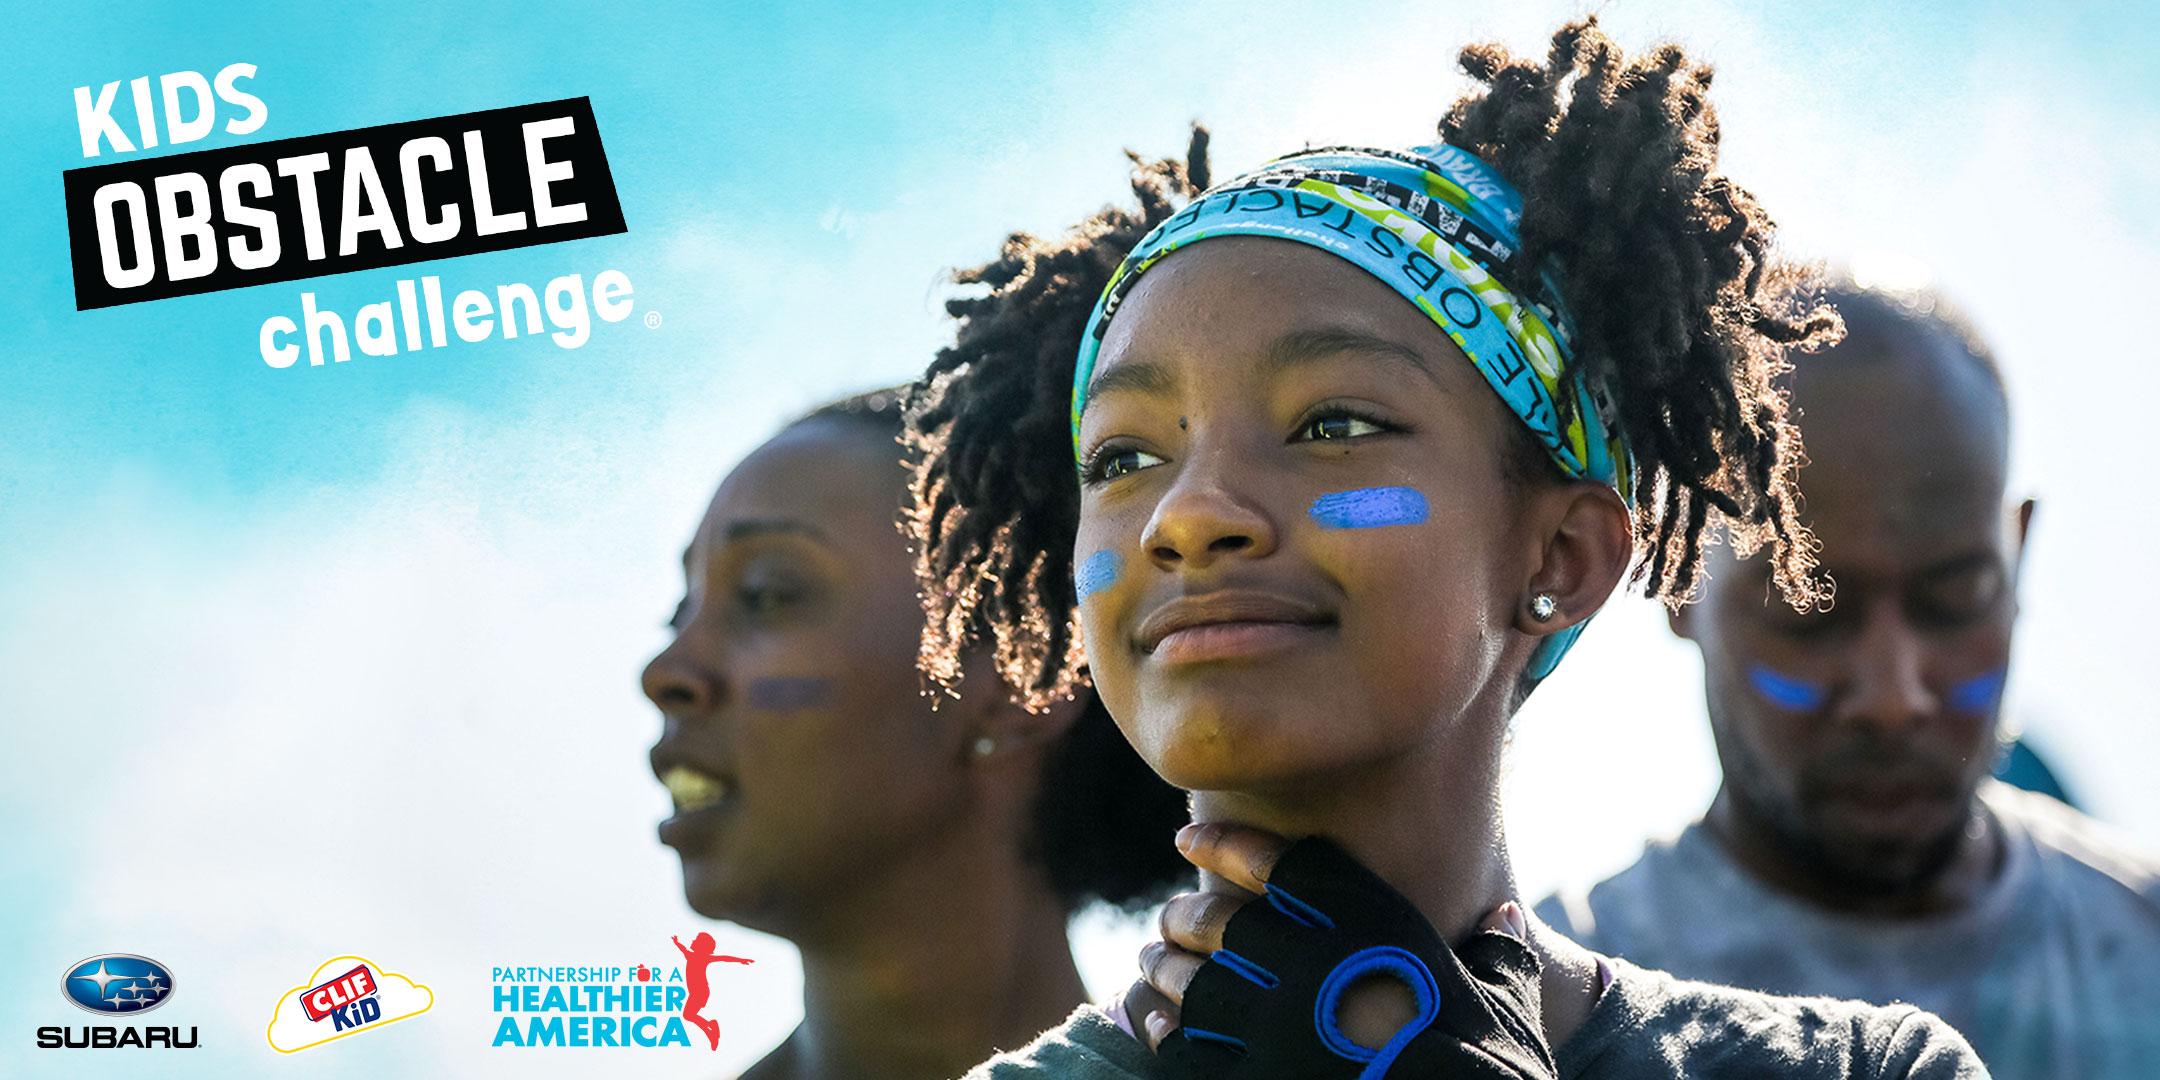 Subaru Kids Obstacle Challenge - San Diego - Saturday